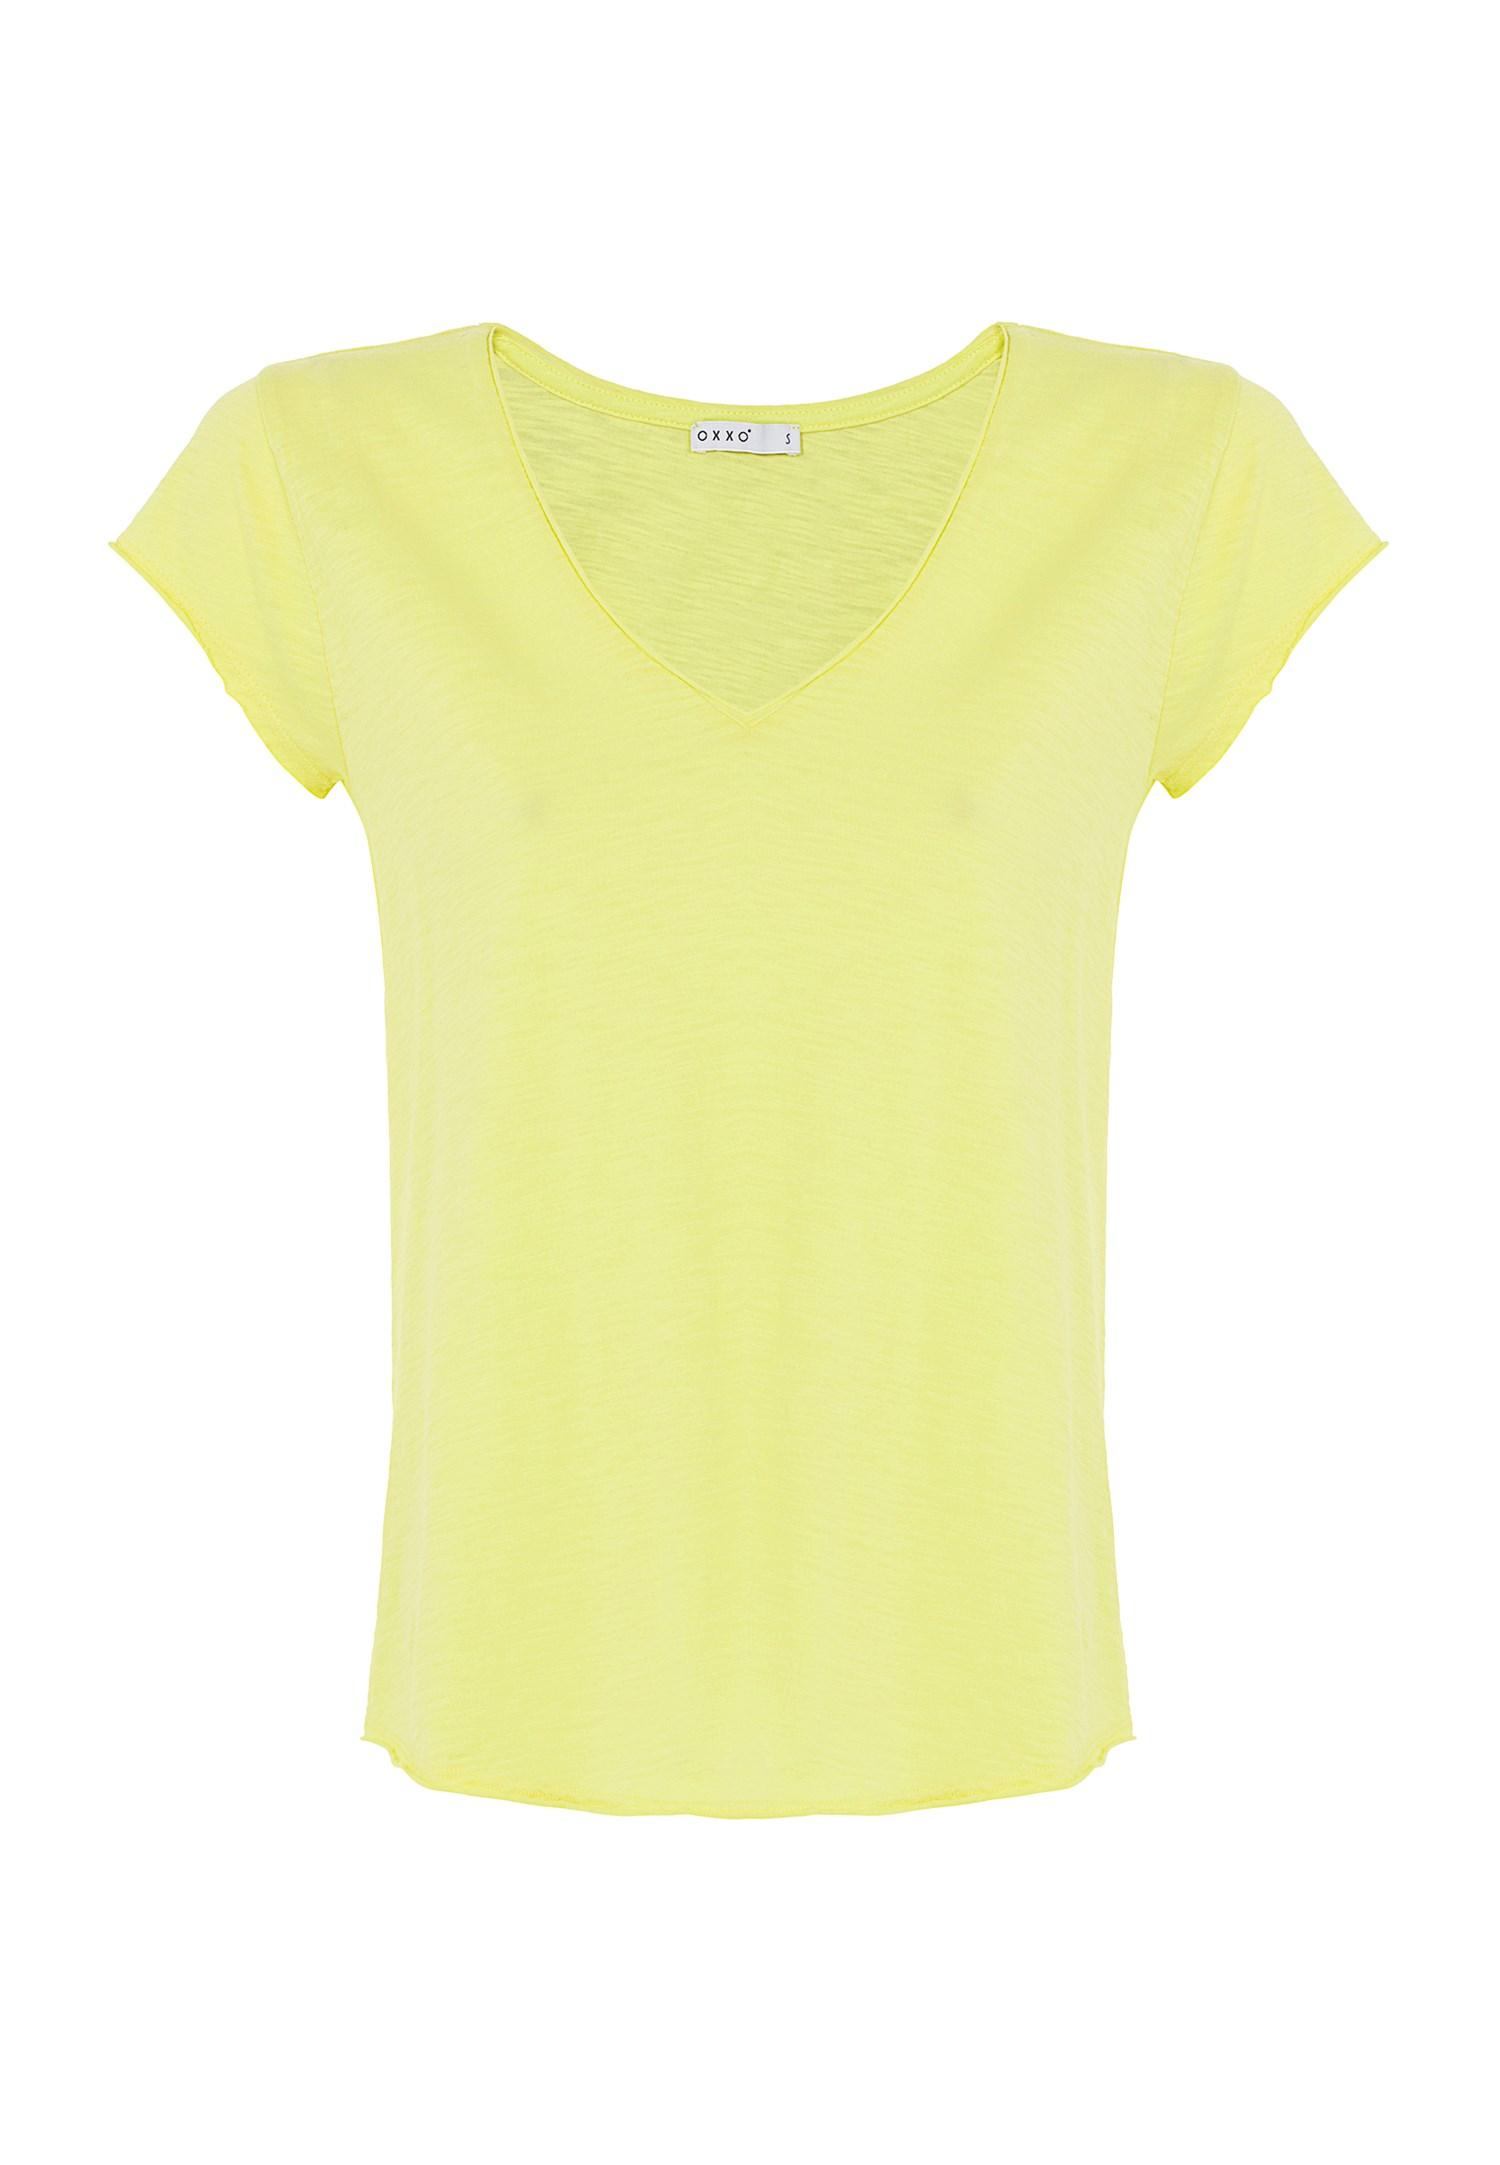 Bayan Sarı Kısa Kollu V Yaka Tişört